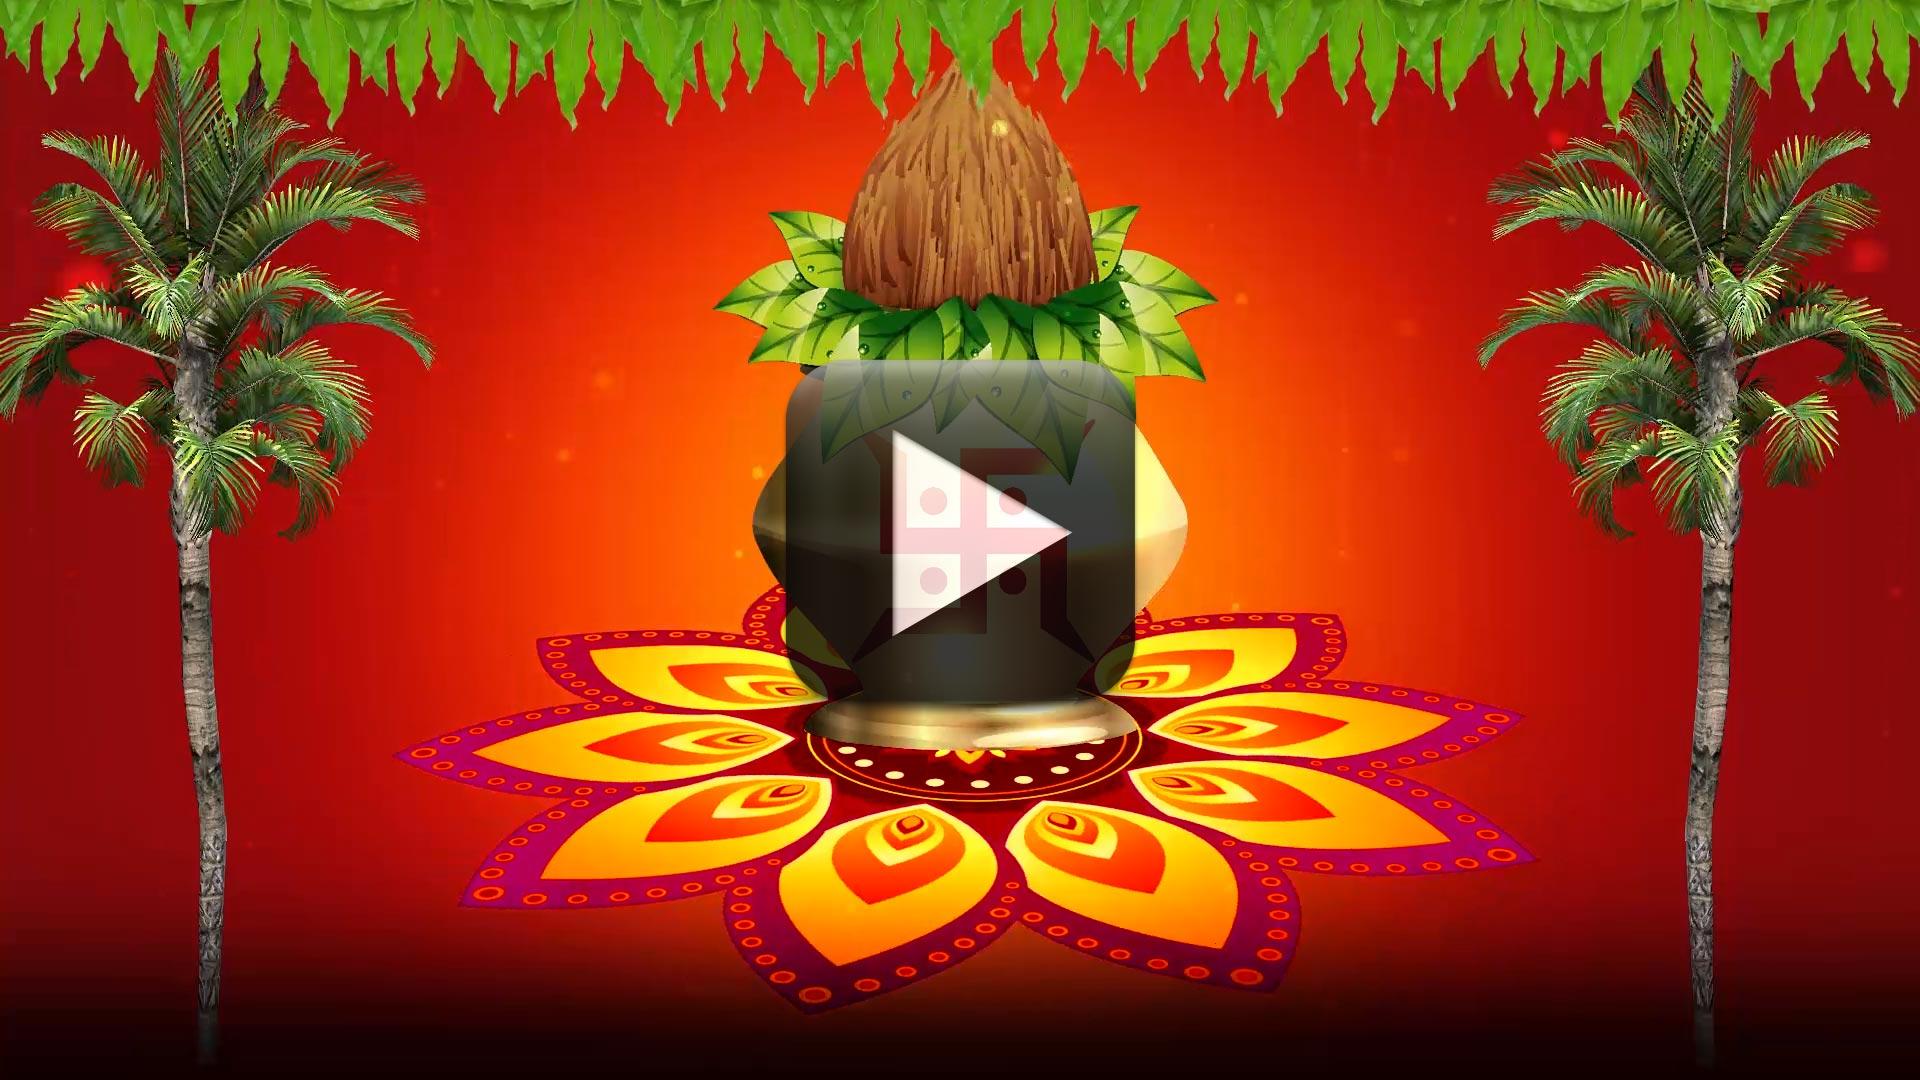 Vivah-mangal-kalash-with-coconut-motion-background